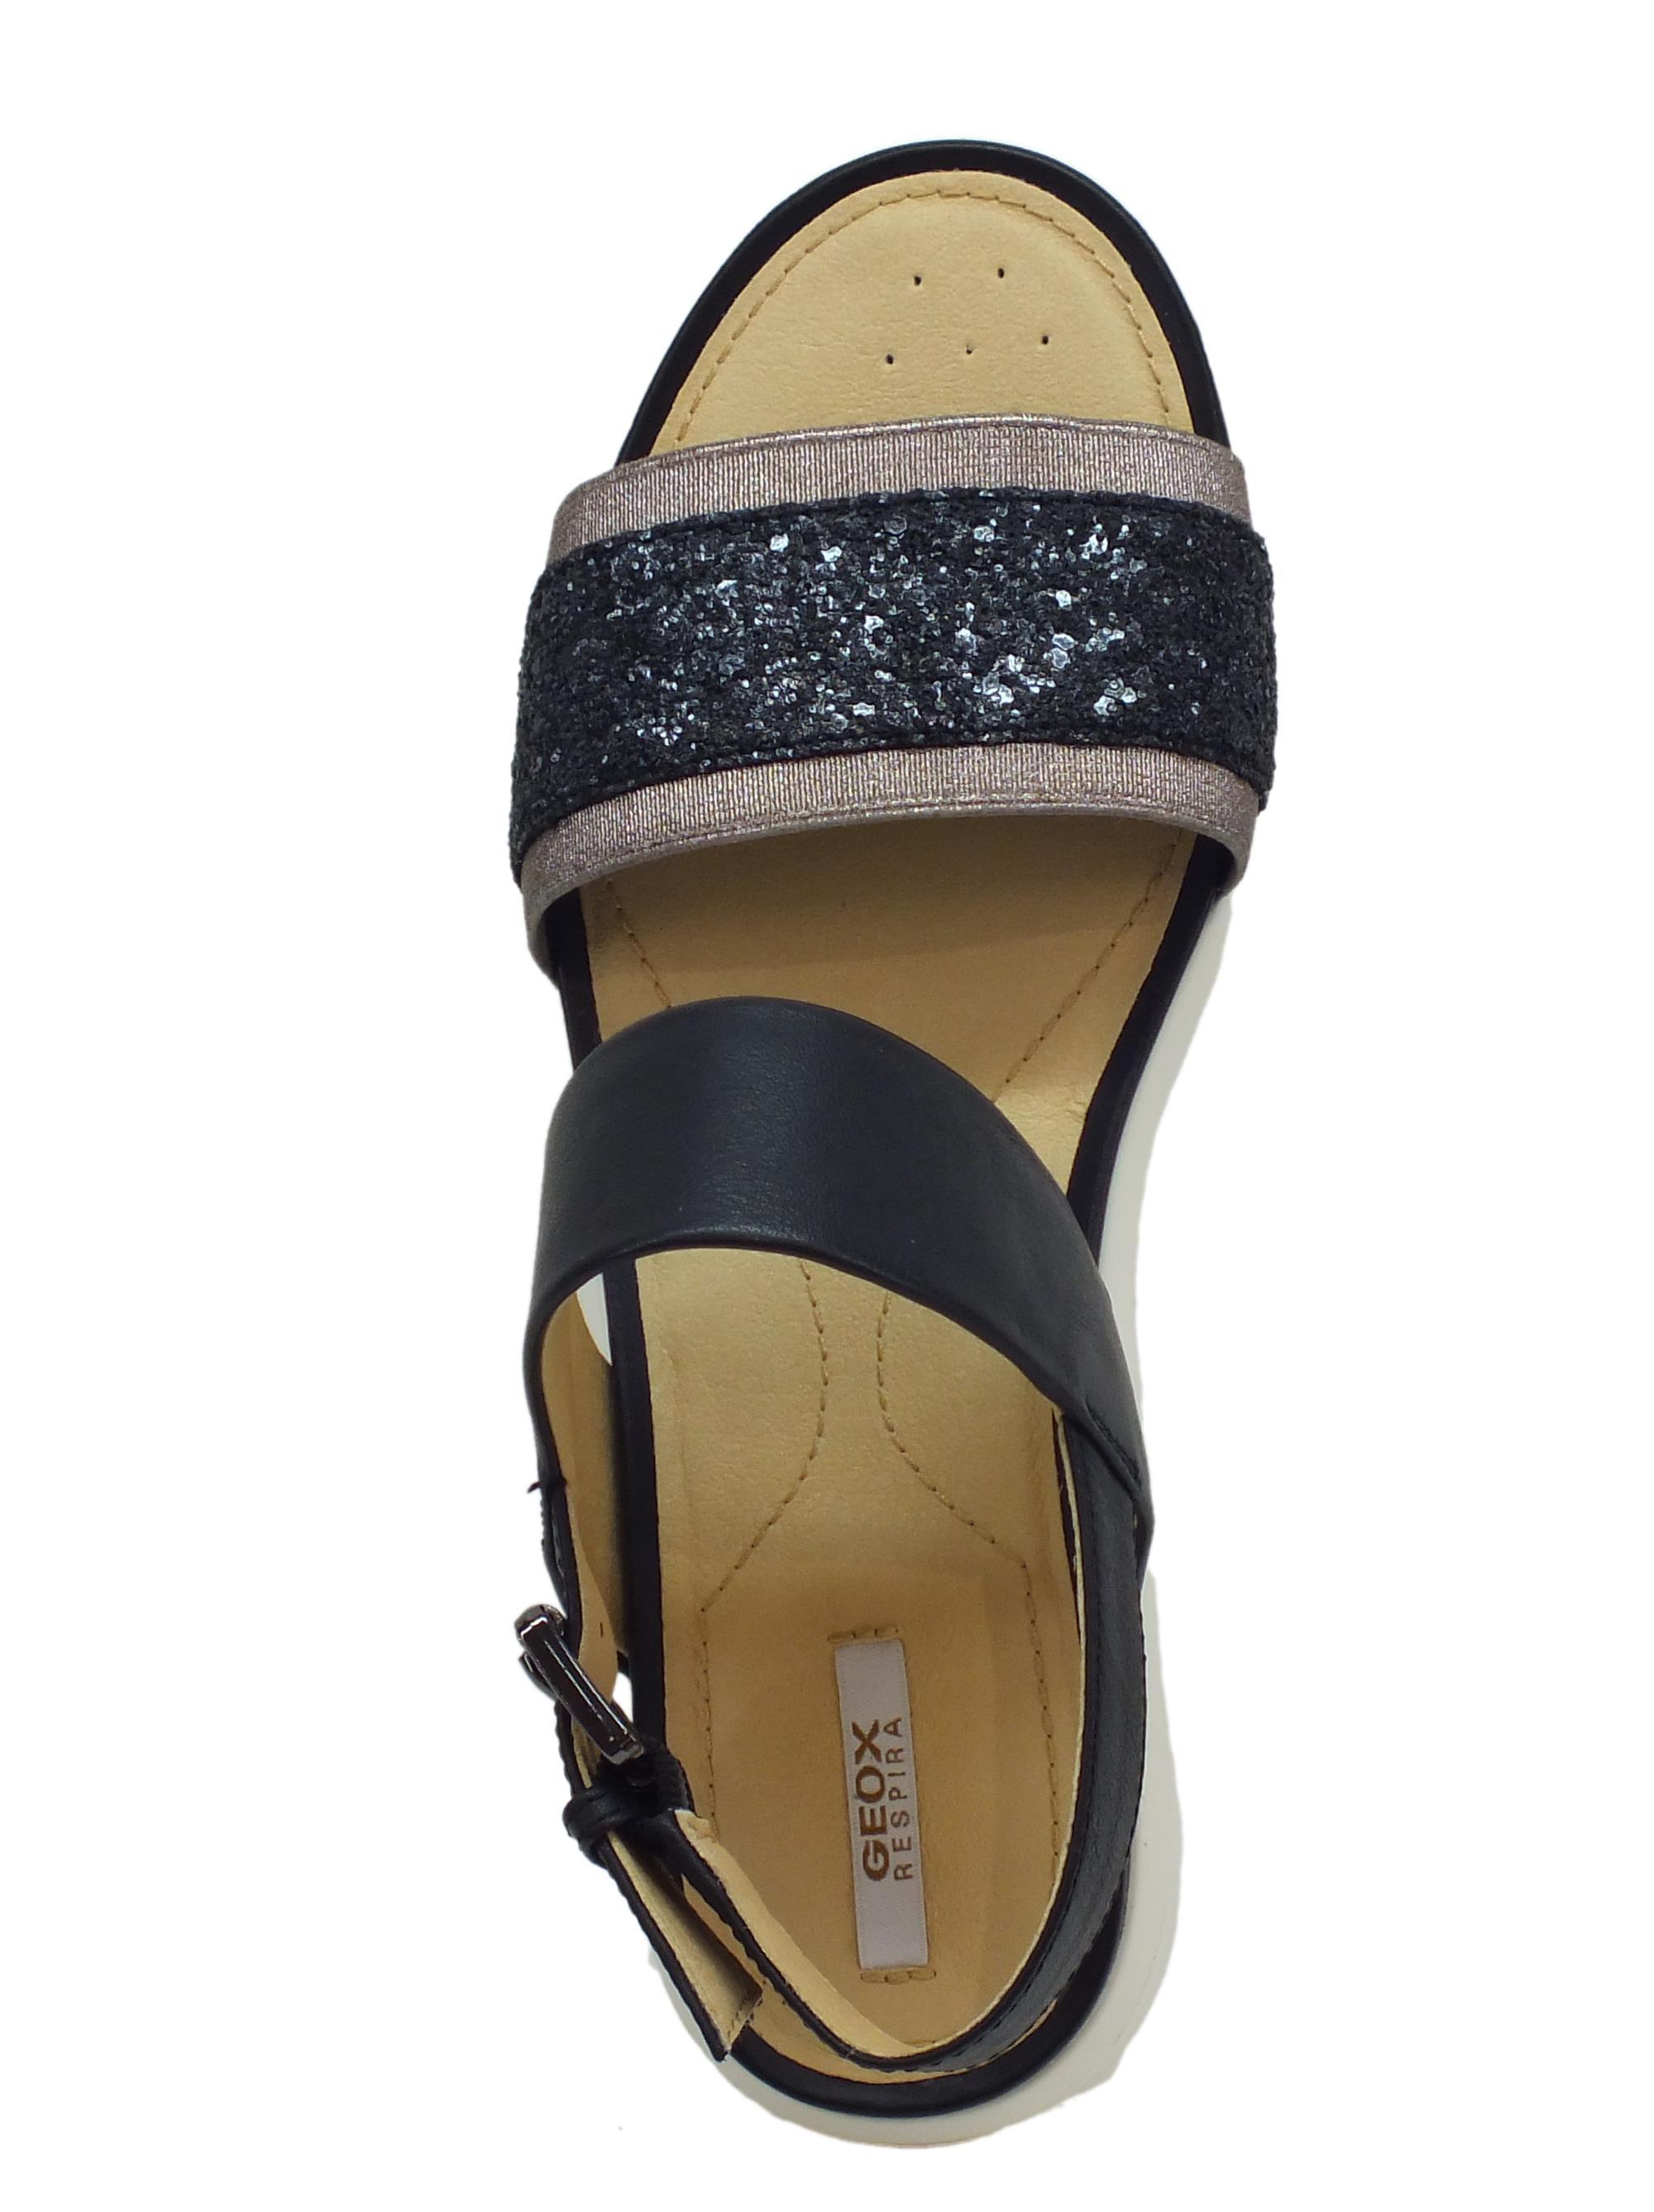 Sandali Geox donna pelle nera zeppa bassa - Vitiello Calzature b3f56f78d63